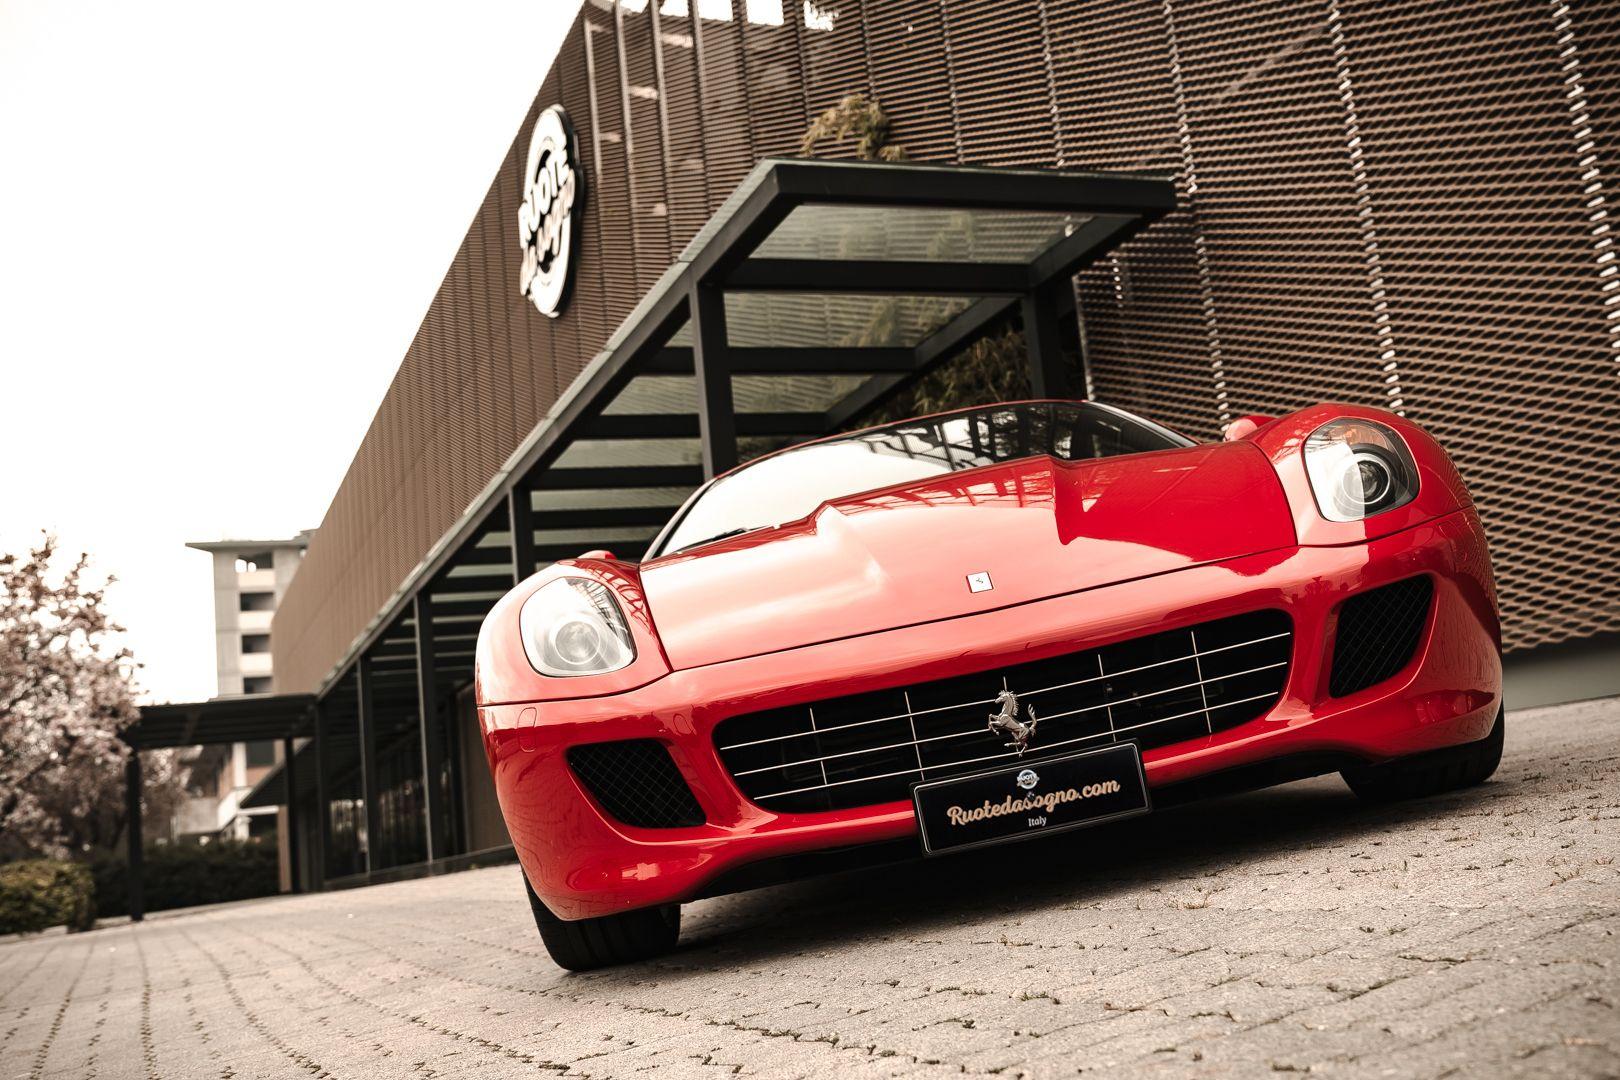 2007 Ferrari 599 GTB Fiorano 64967